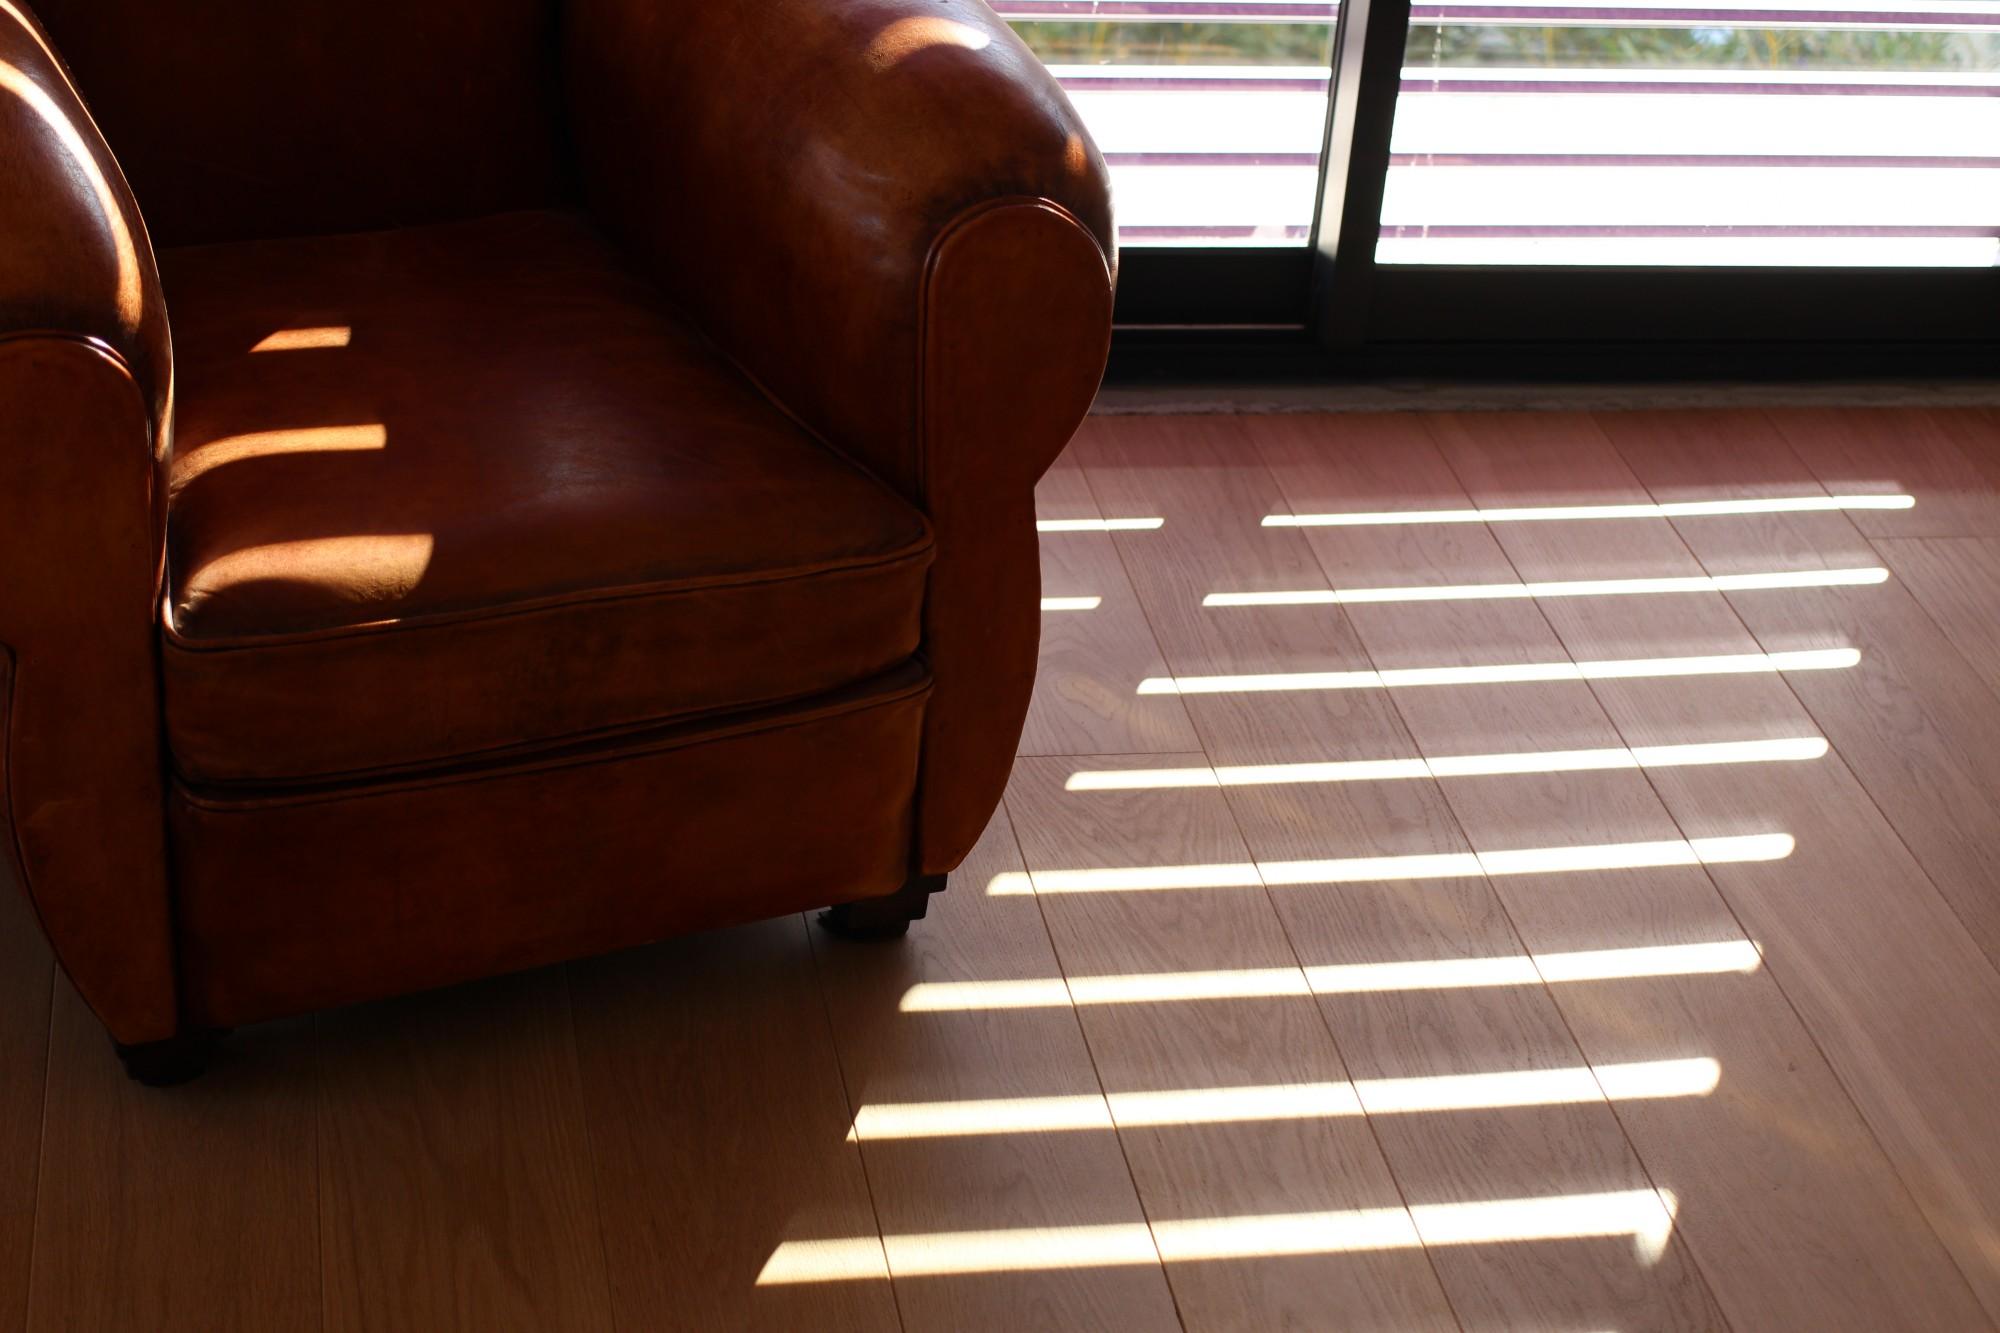 tarif pon age et d capage de sol en marbre aubagne jb briche. Black Bedroom Furniture Sets. Home Design Ideas